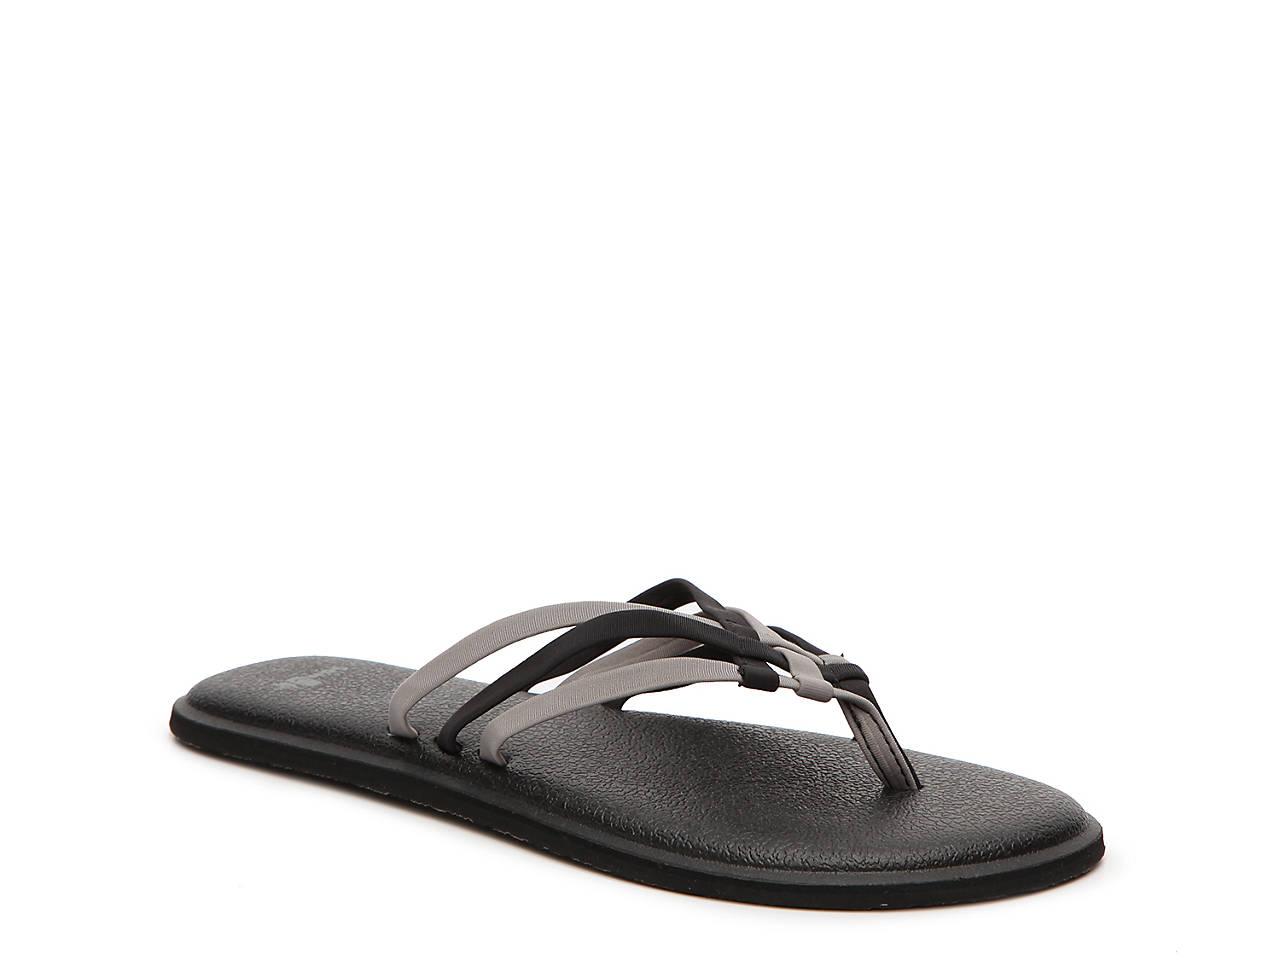 6f785034f48a89 Sanuk Yoga Salty Flip Flop Women s Shoes